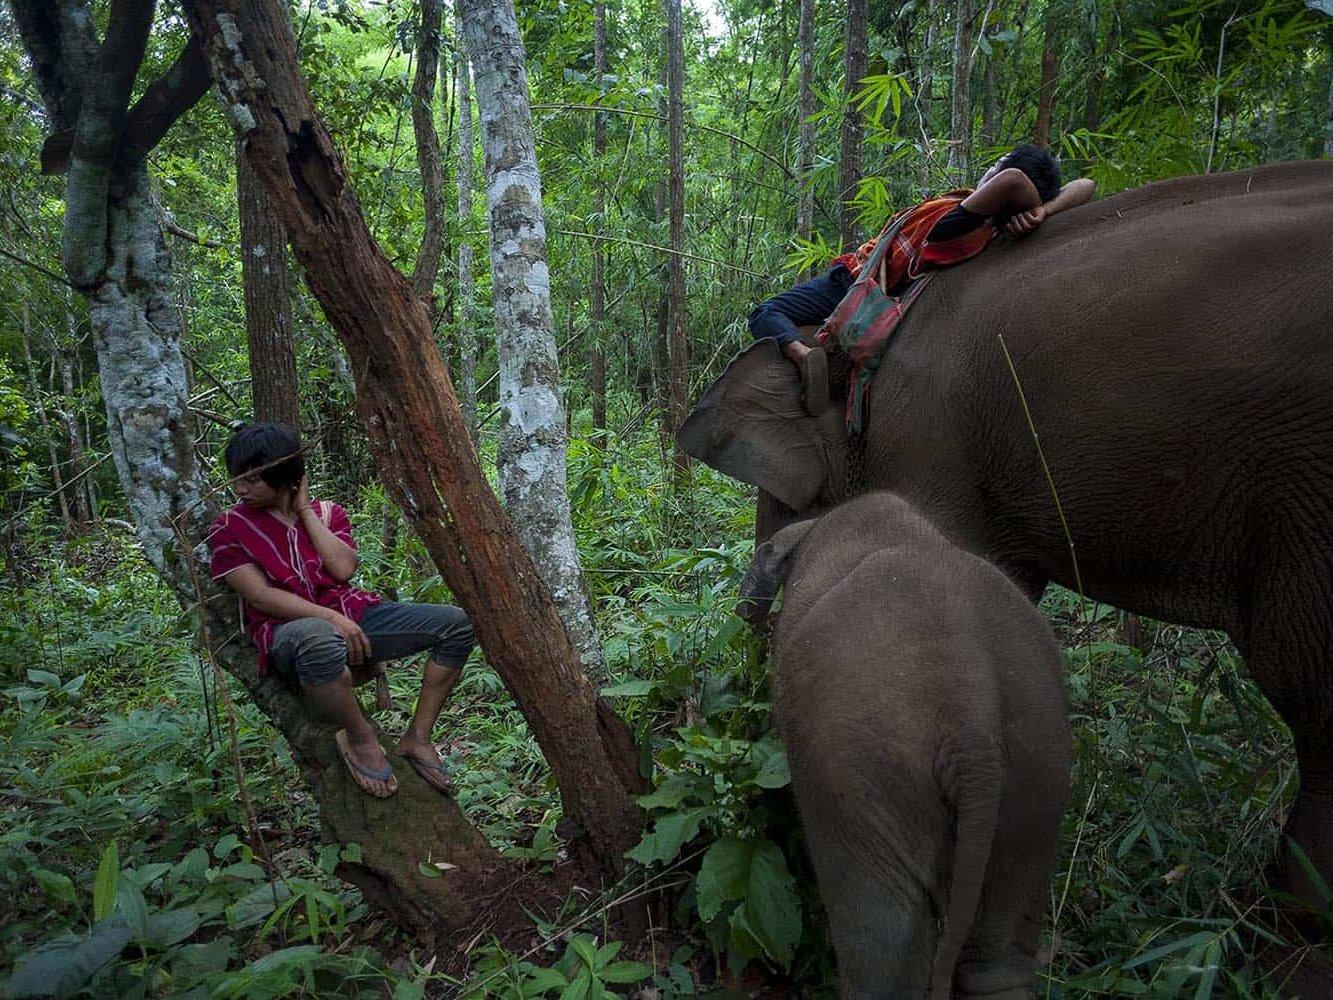 vietnam photographer mahout family binhdang 8